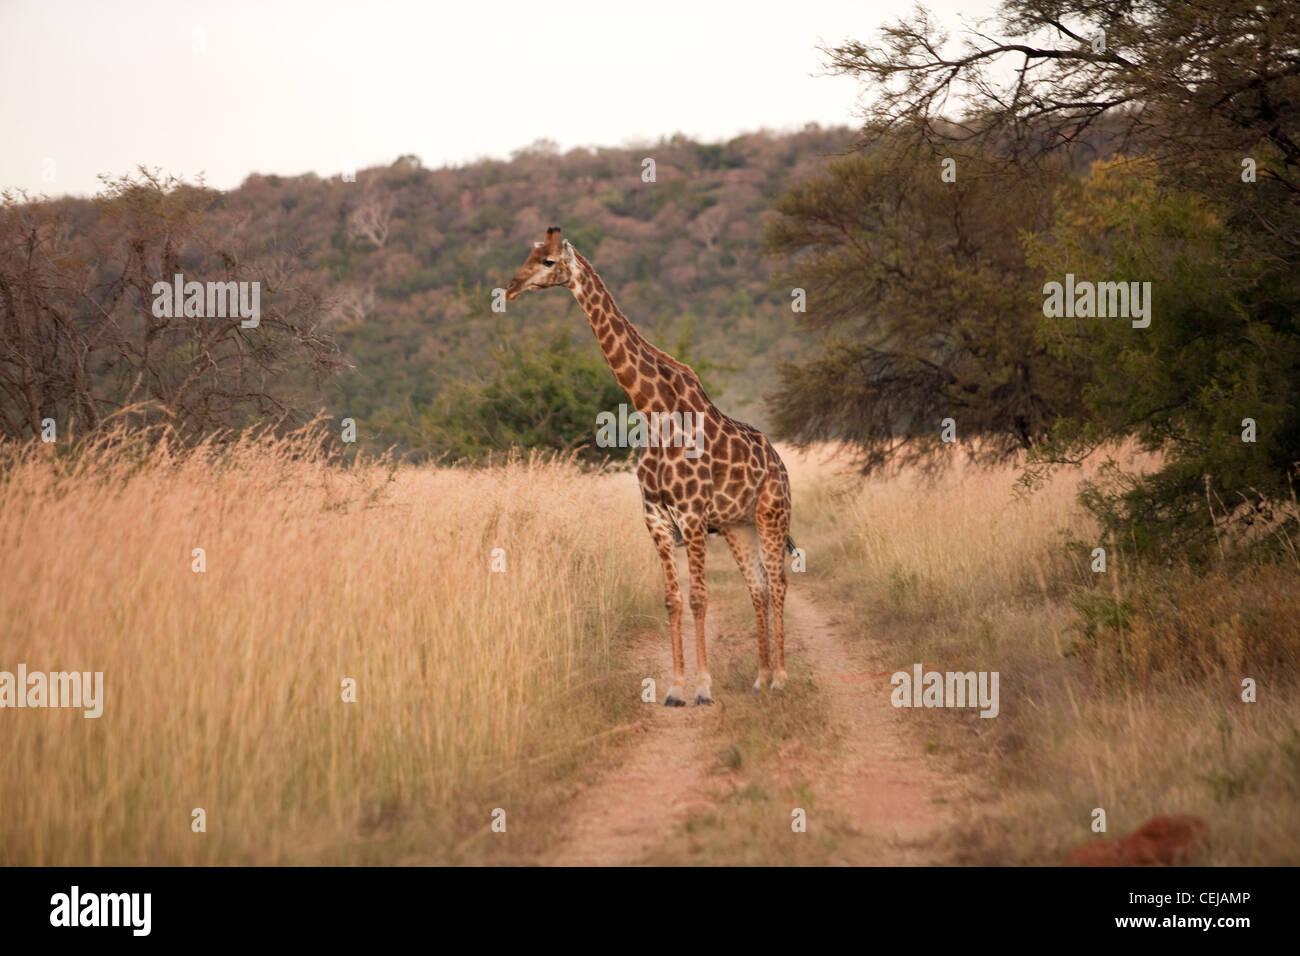 Jirafa,leyendas Reserva de Caza,Provincia de Limpopo Imagen De Stock